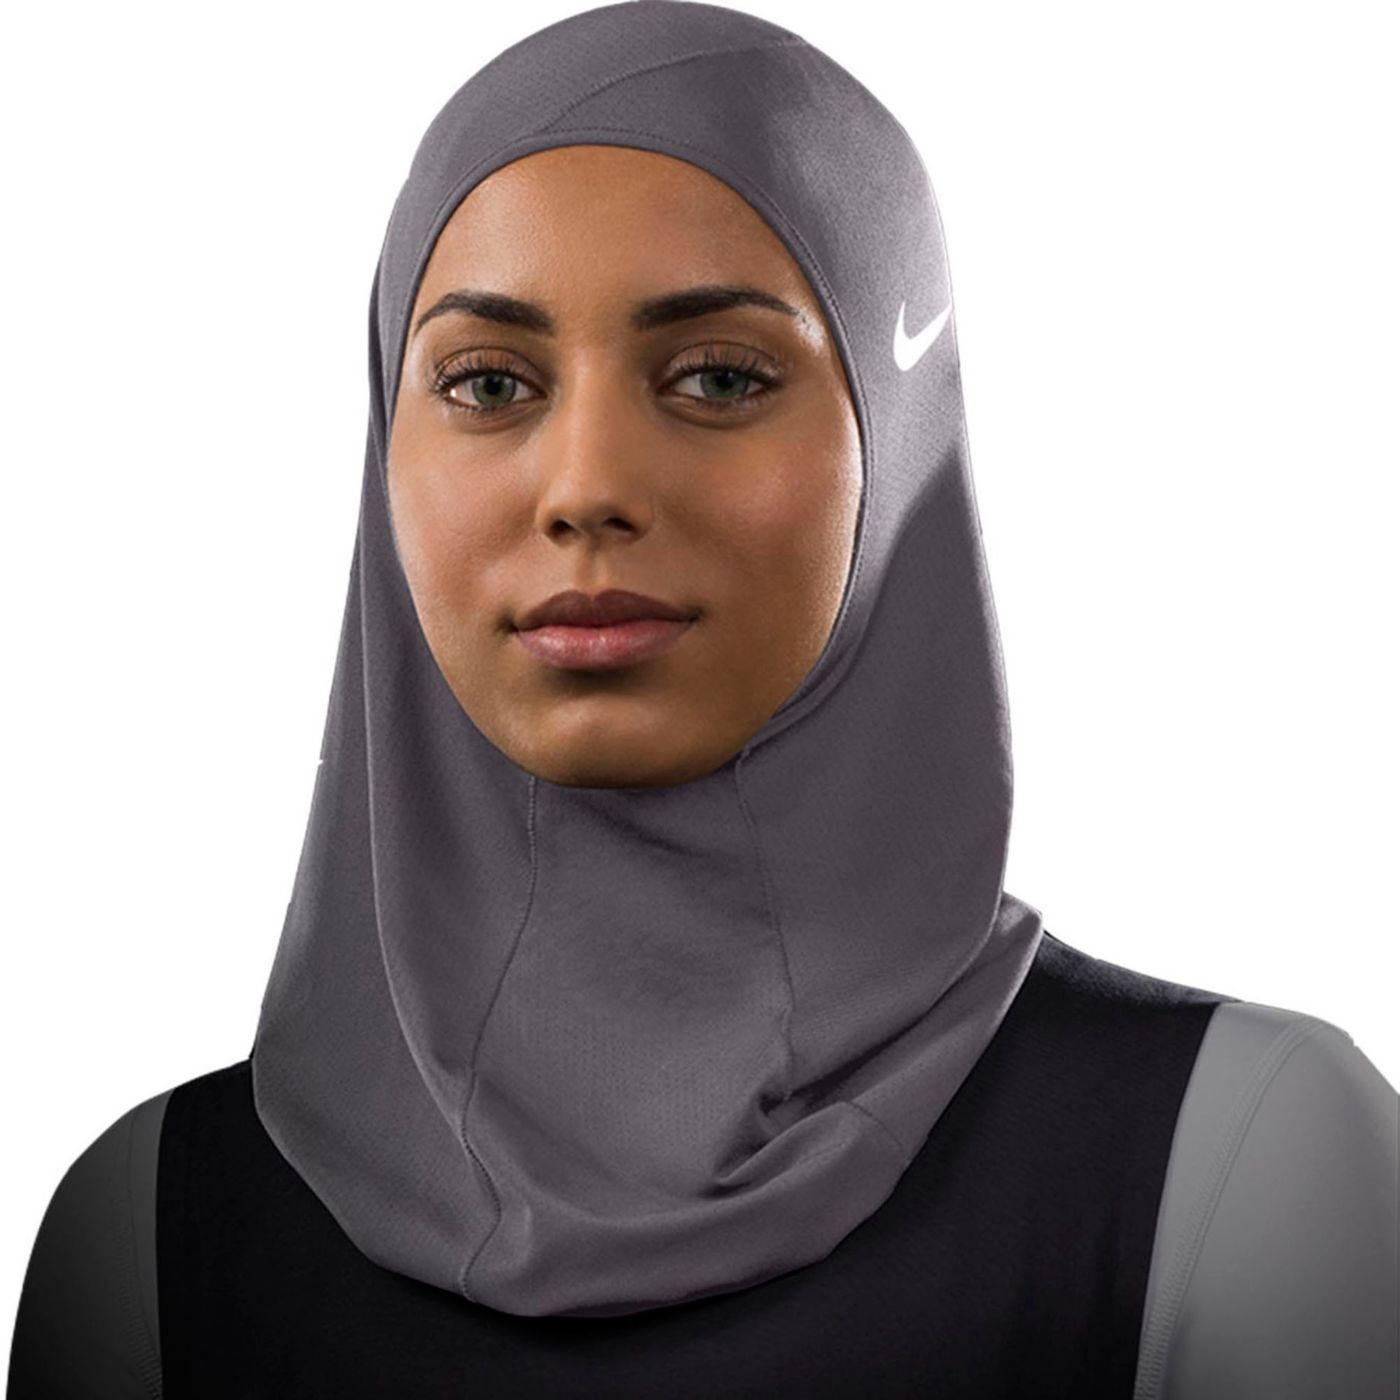 Nike Women's Pro Hijab